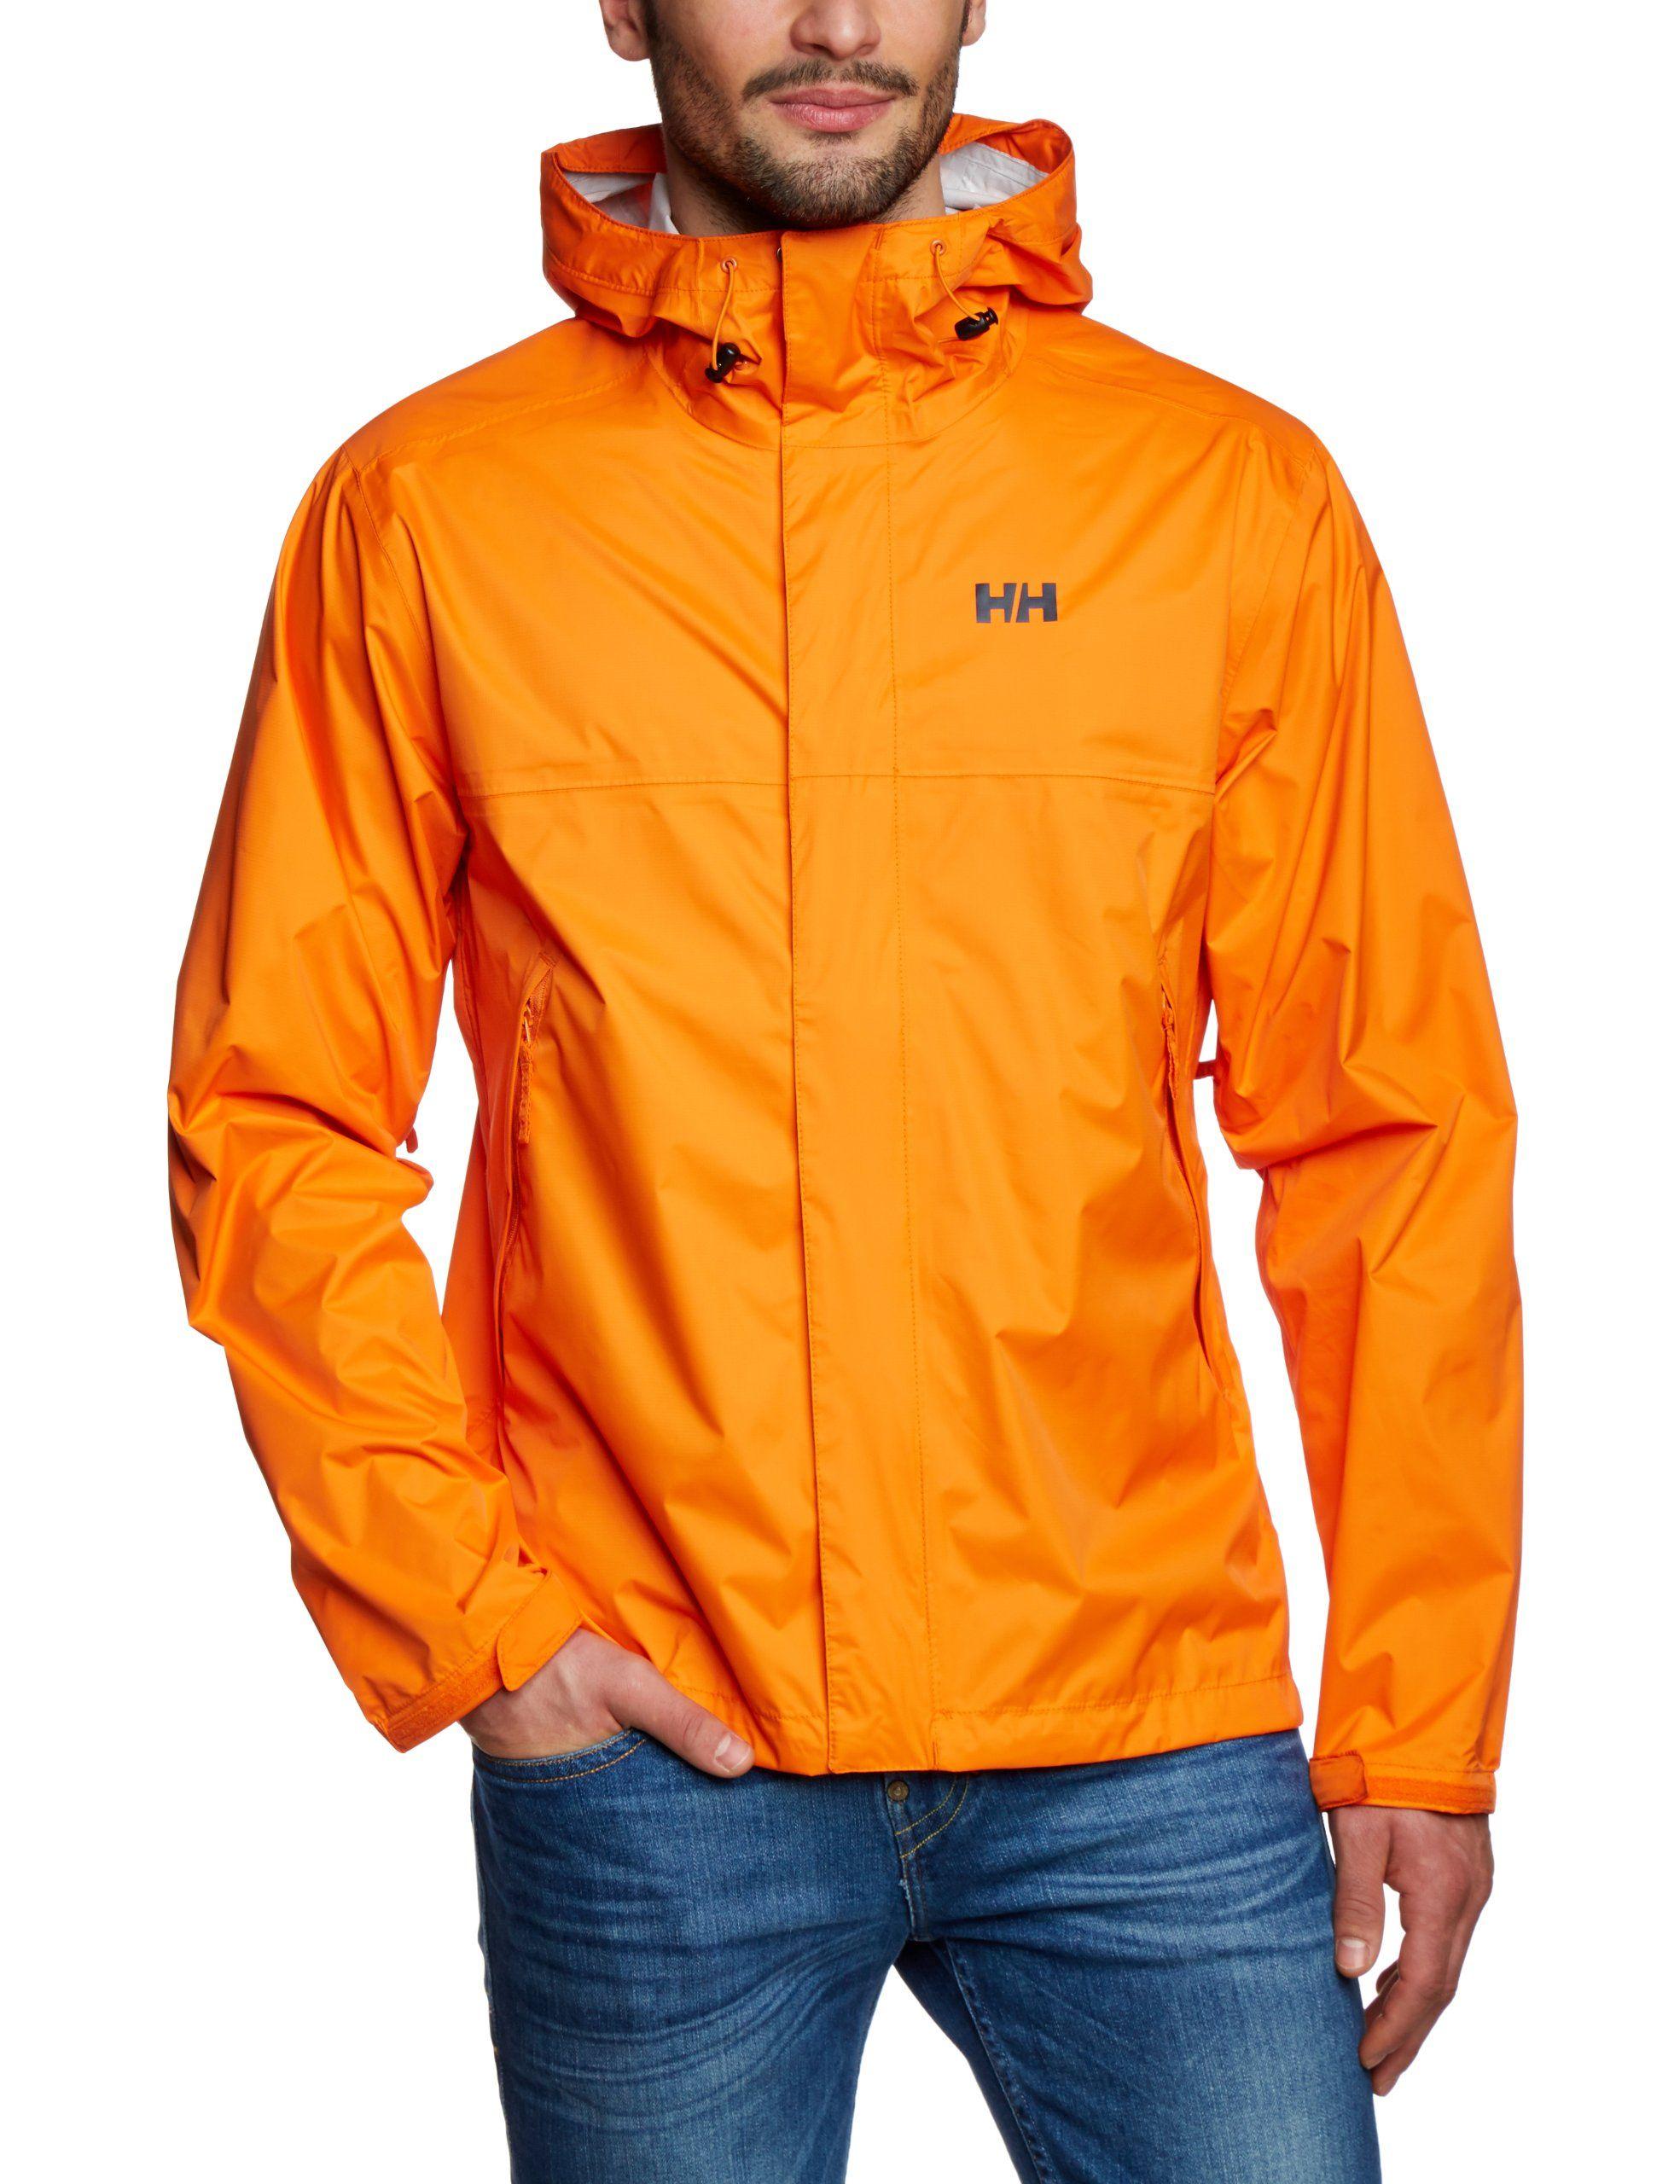 226b35906f Amazon.com : Helly Hansen Loke Running Jacket, orange or not ...